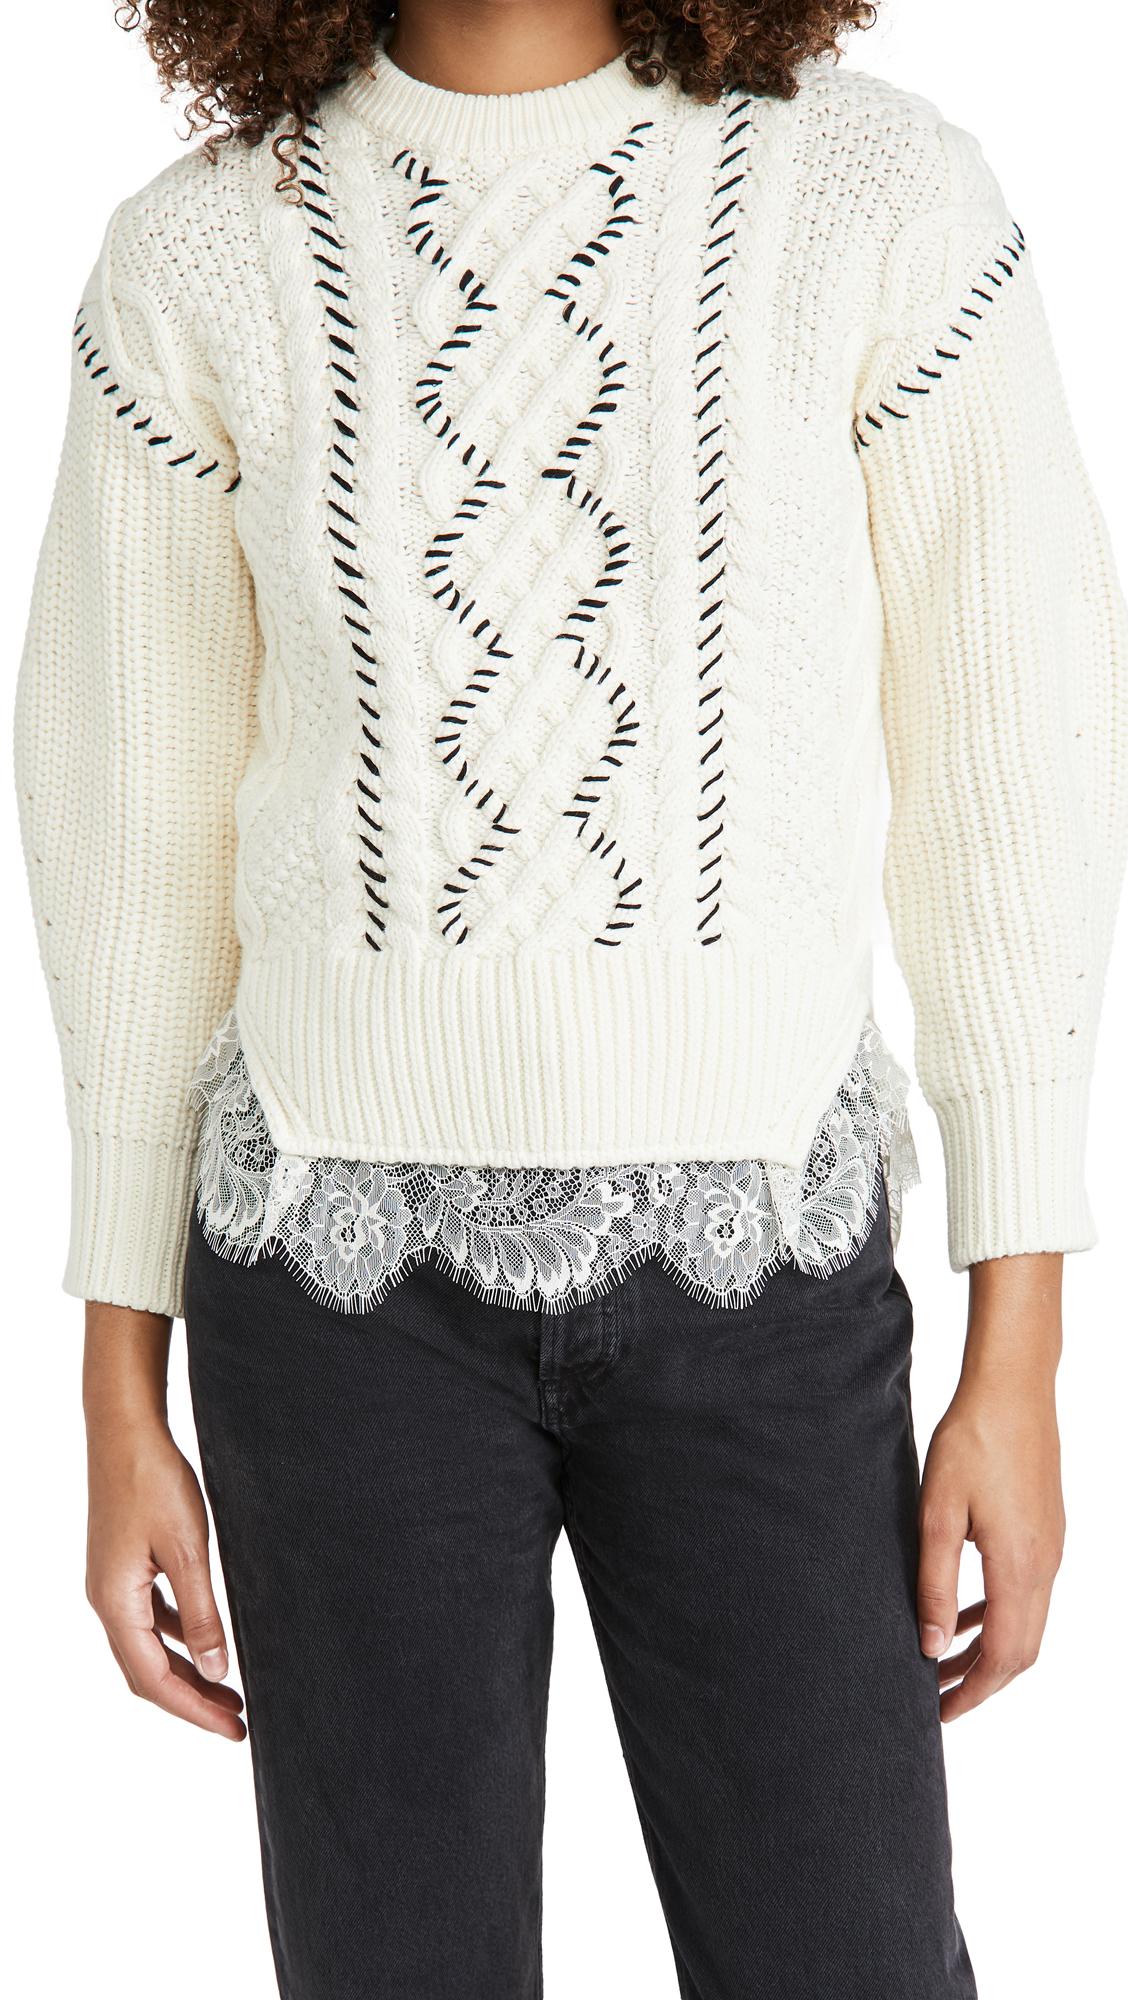 Self Portrait Cable Knit Contrast Stitch Sweater